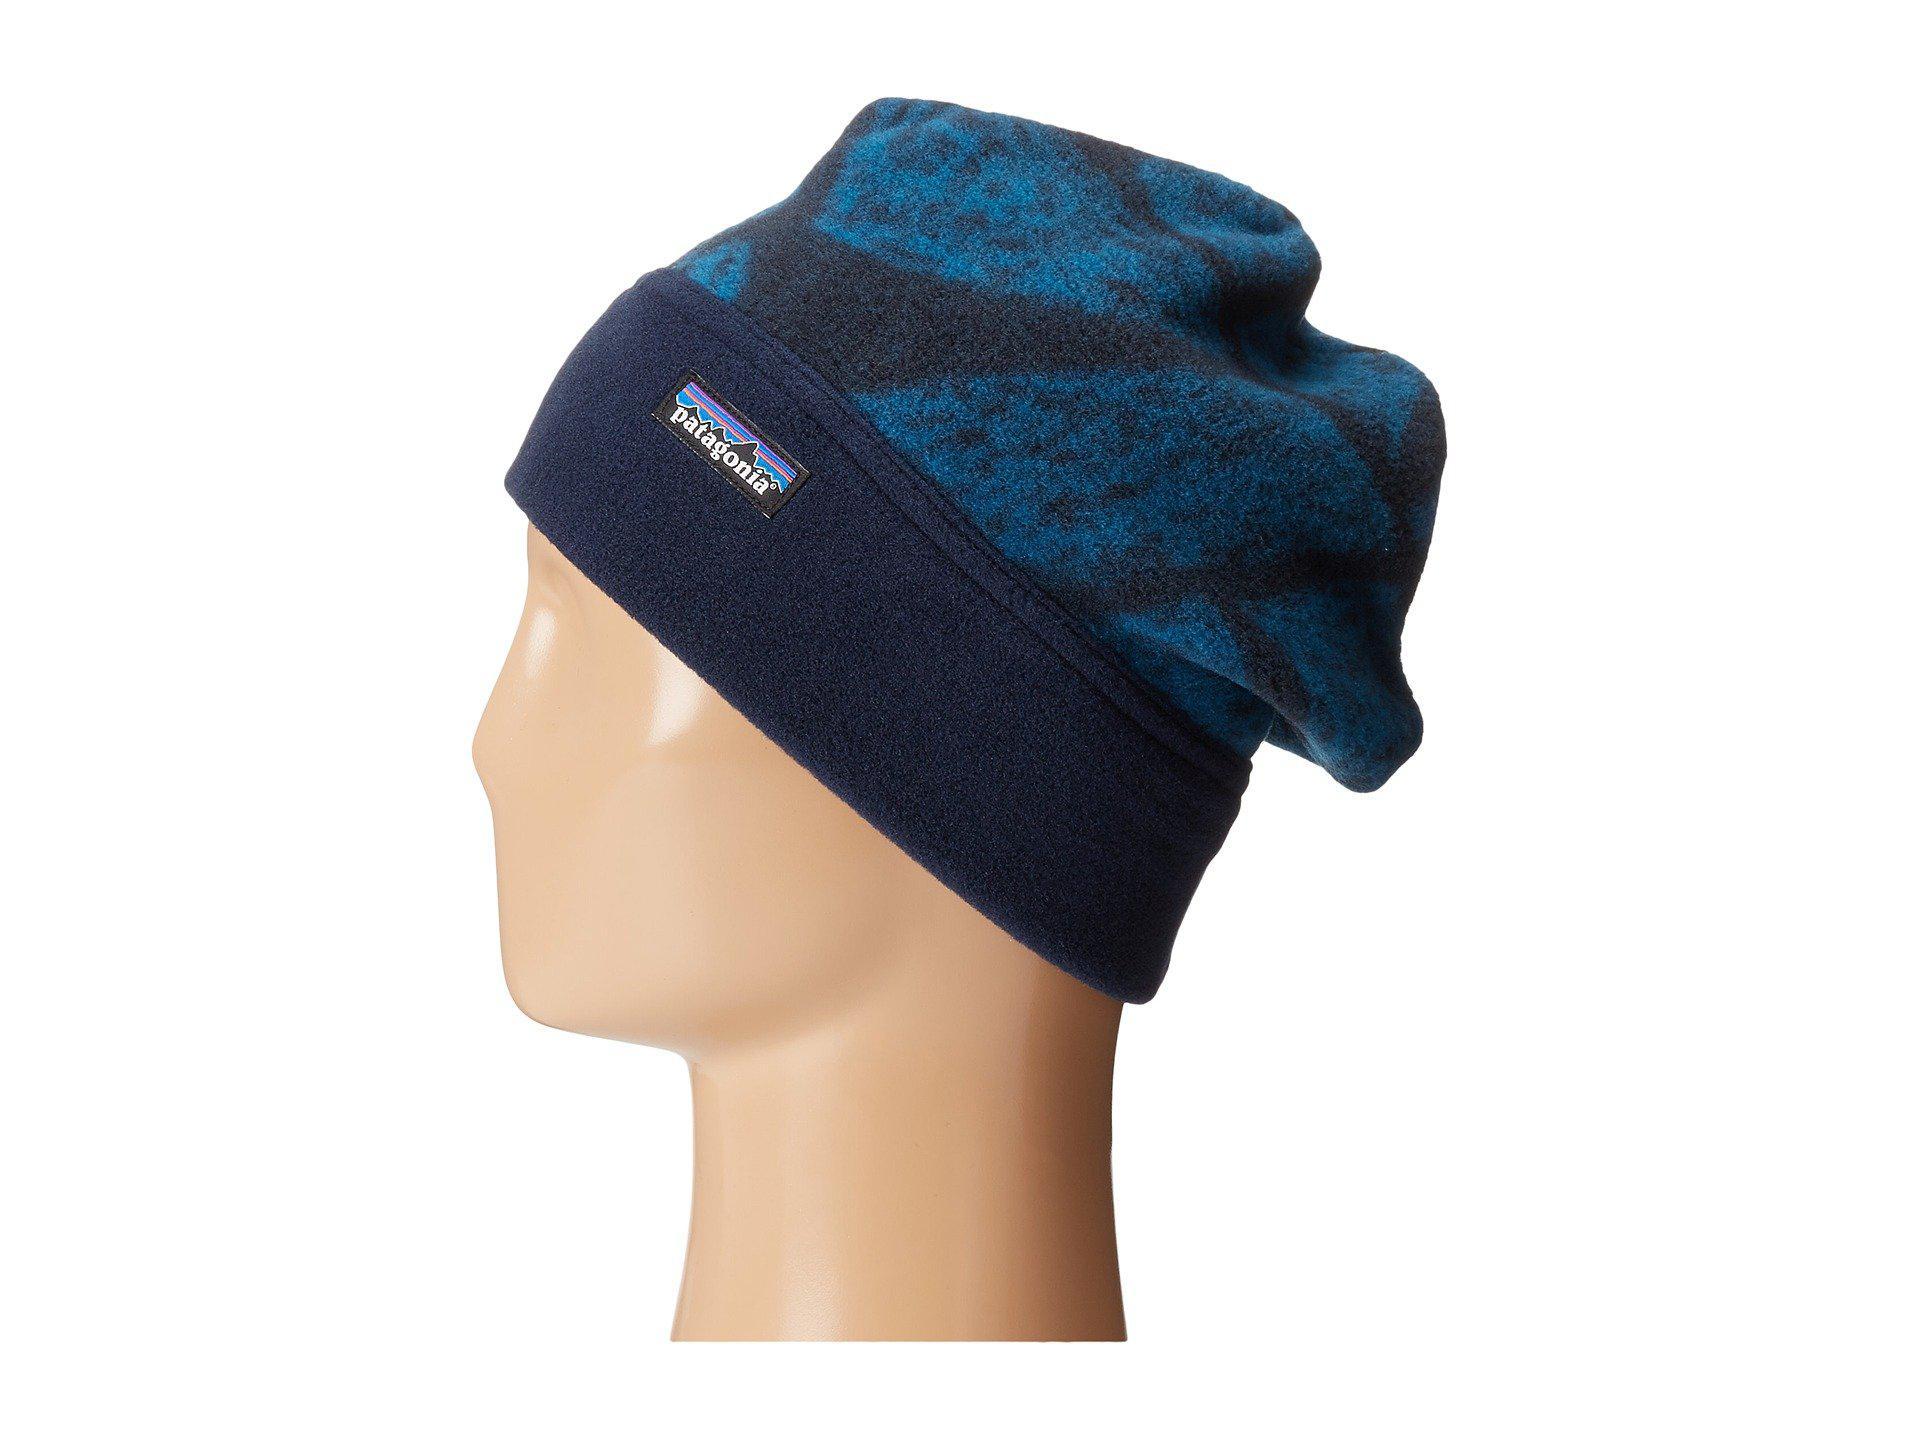 Lyst - Patagonia Synch Alpine Hat in Blue 65bb5505dc5